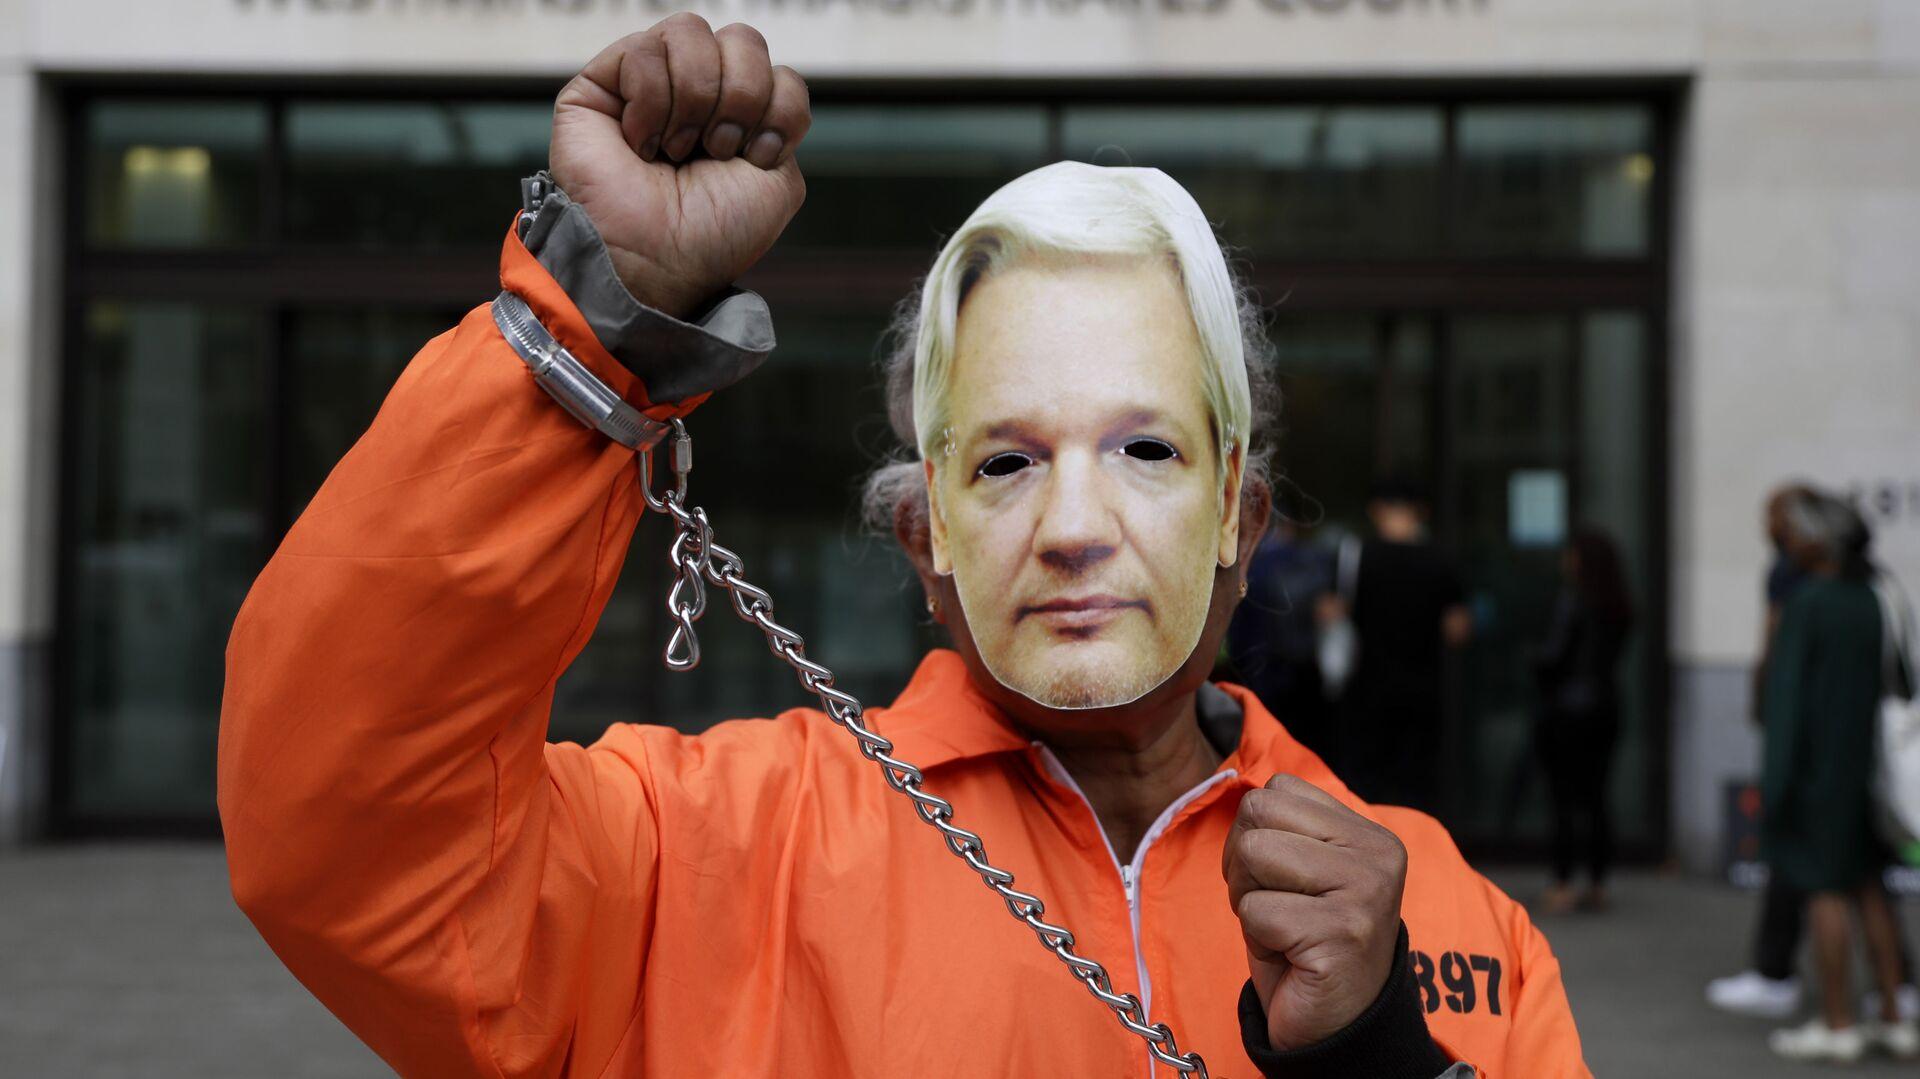 Un manifestante por la liberación del fundador de Wikileaks, Julian Assange - Sputnik Mundo, 1920, 03.06.2021